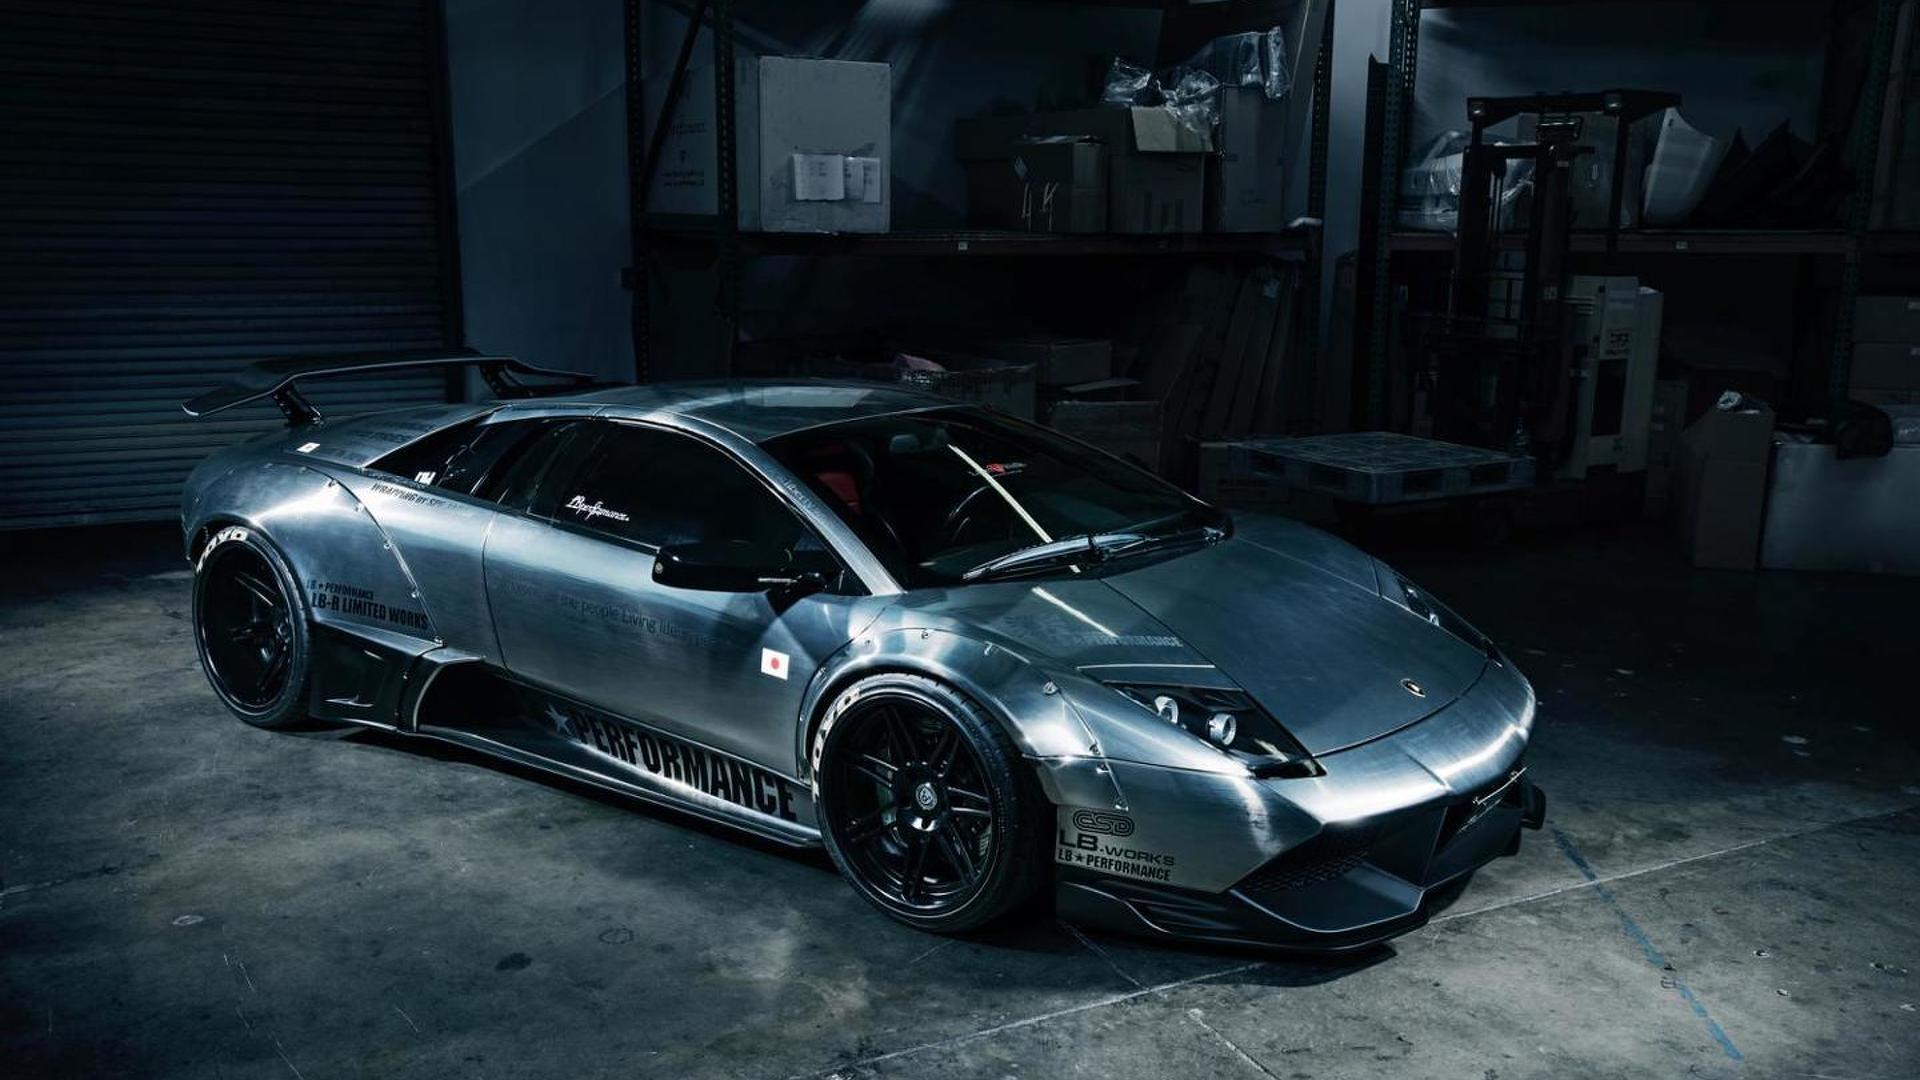 Lamborghini Murcielago With Brushed Aluminum Wide Body Kit